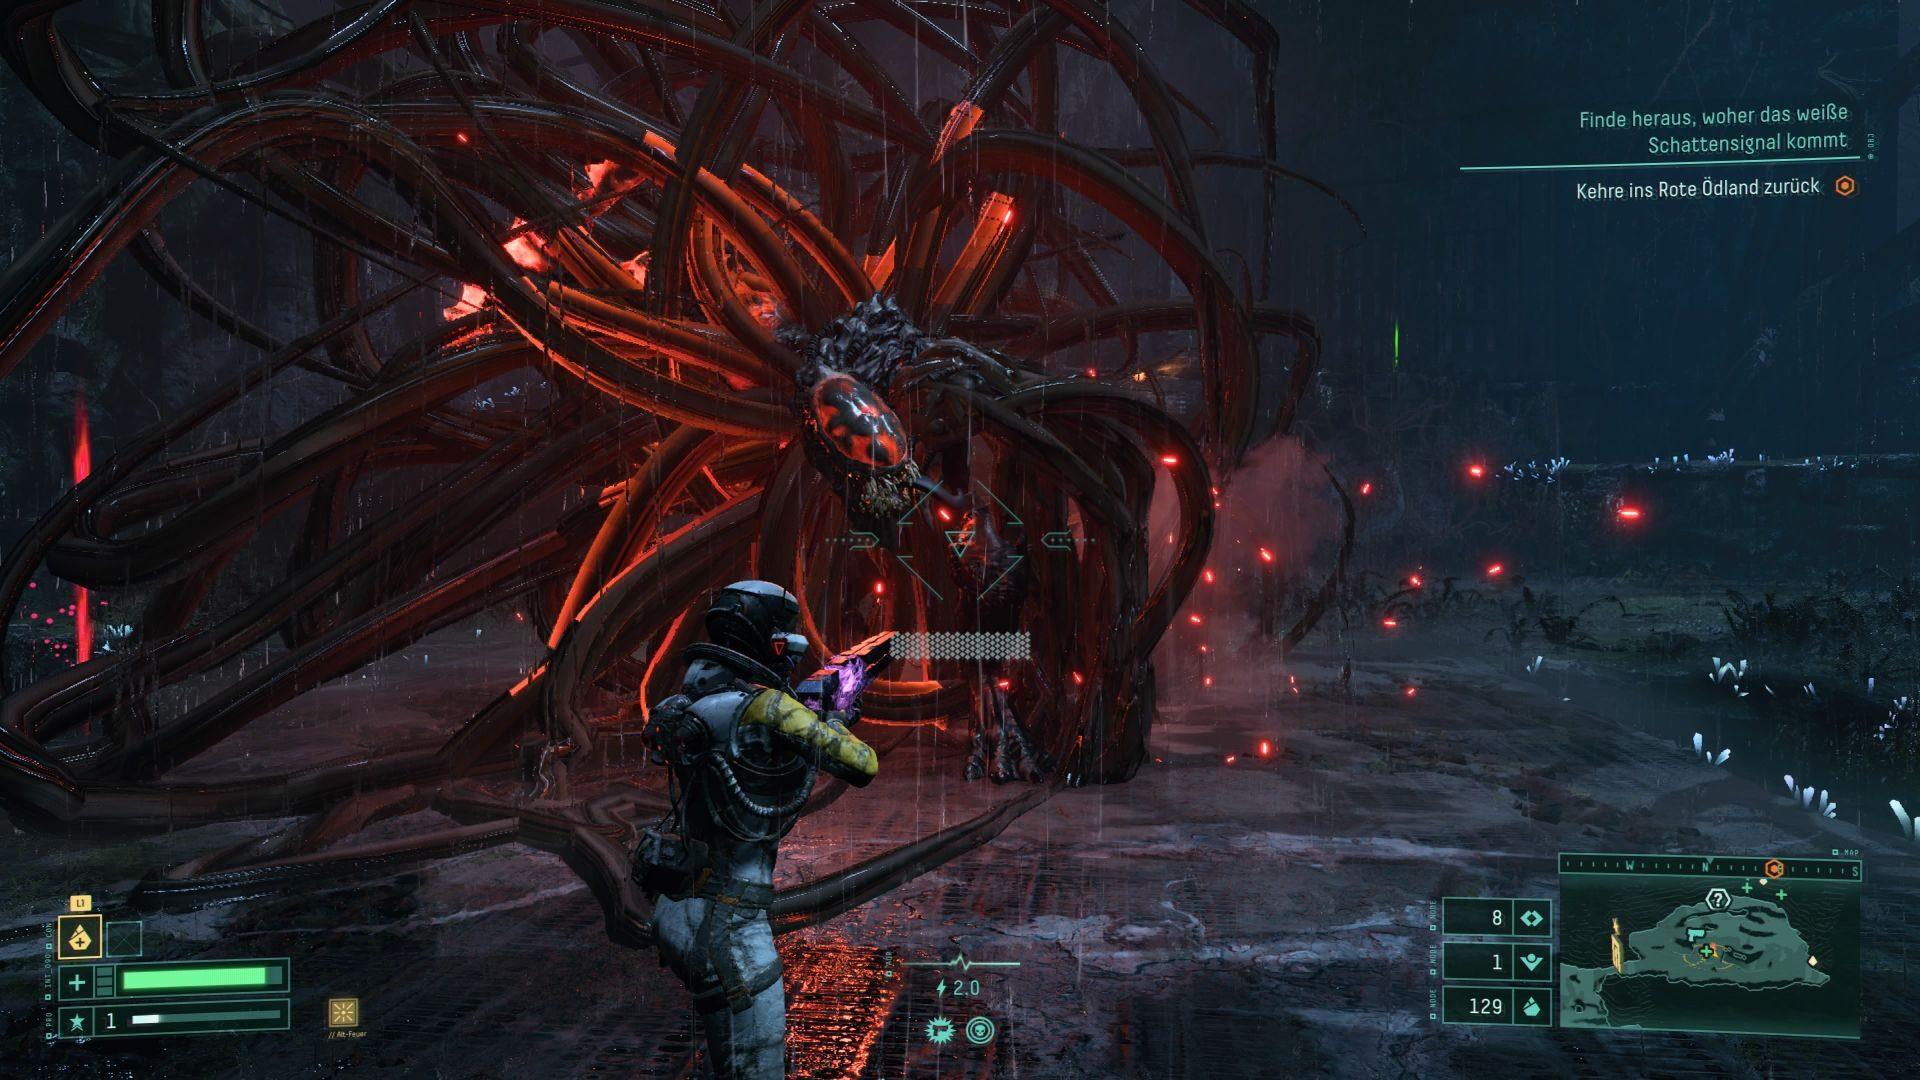 An extraterrestrial monster attacks astronaut Selen in Returnal.